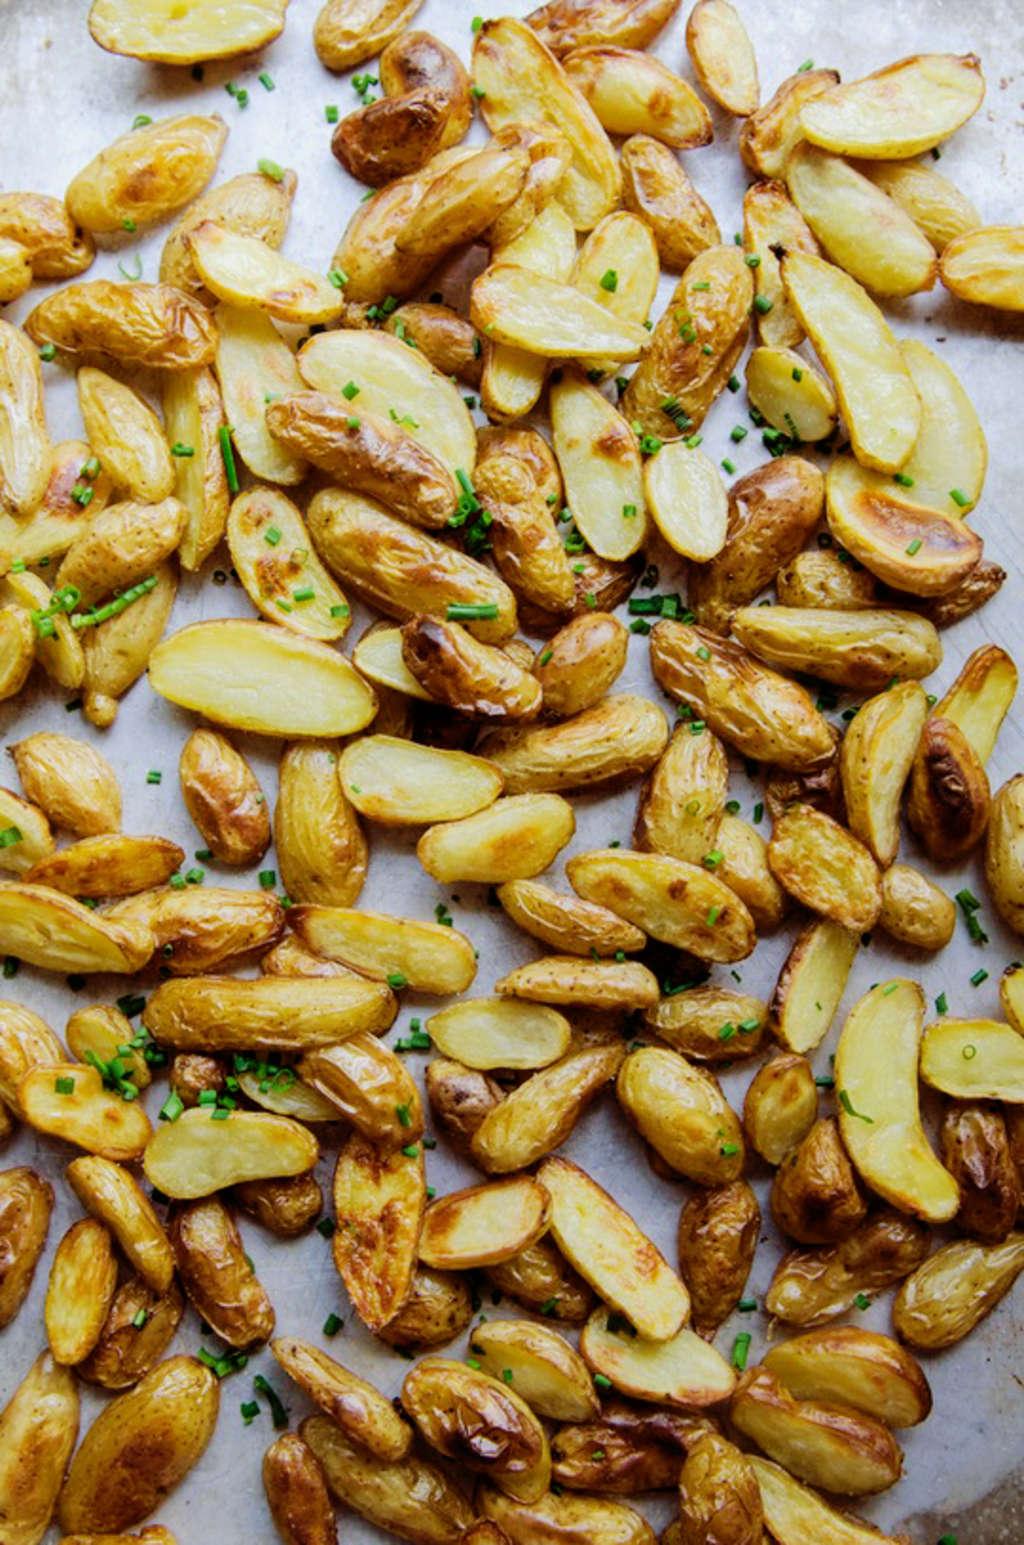 Potato Recipe of the Year: Crispy Salt & Vinegar Potatoes